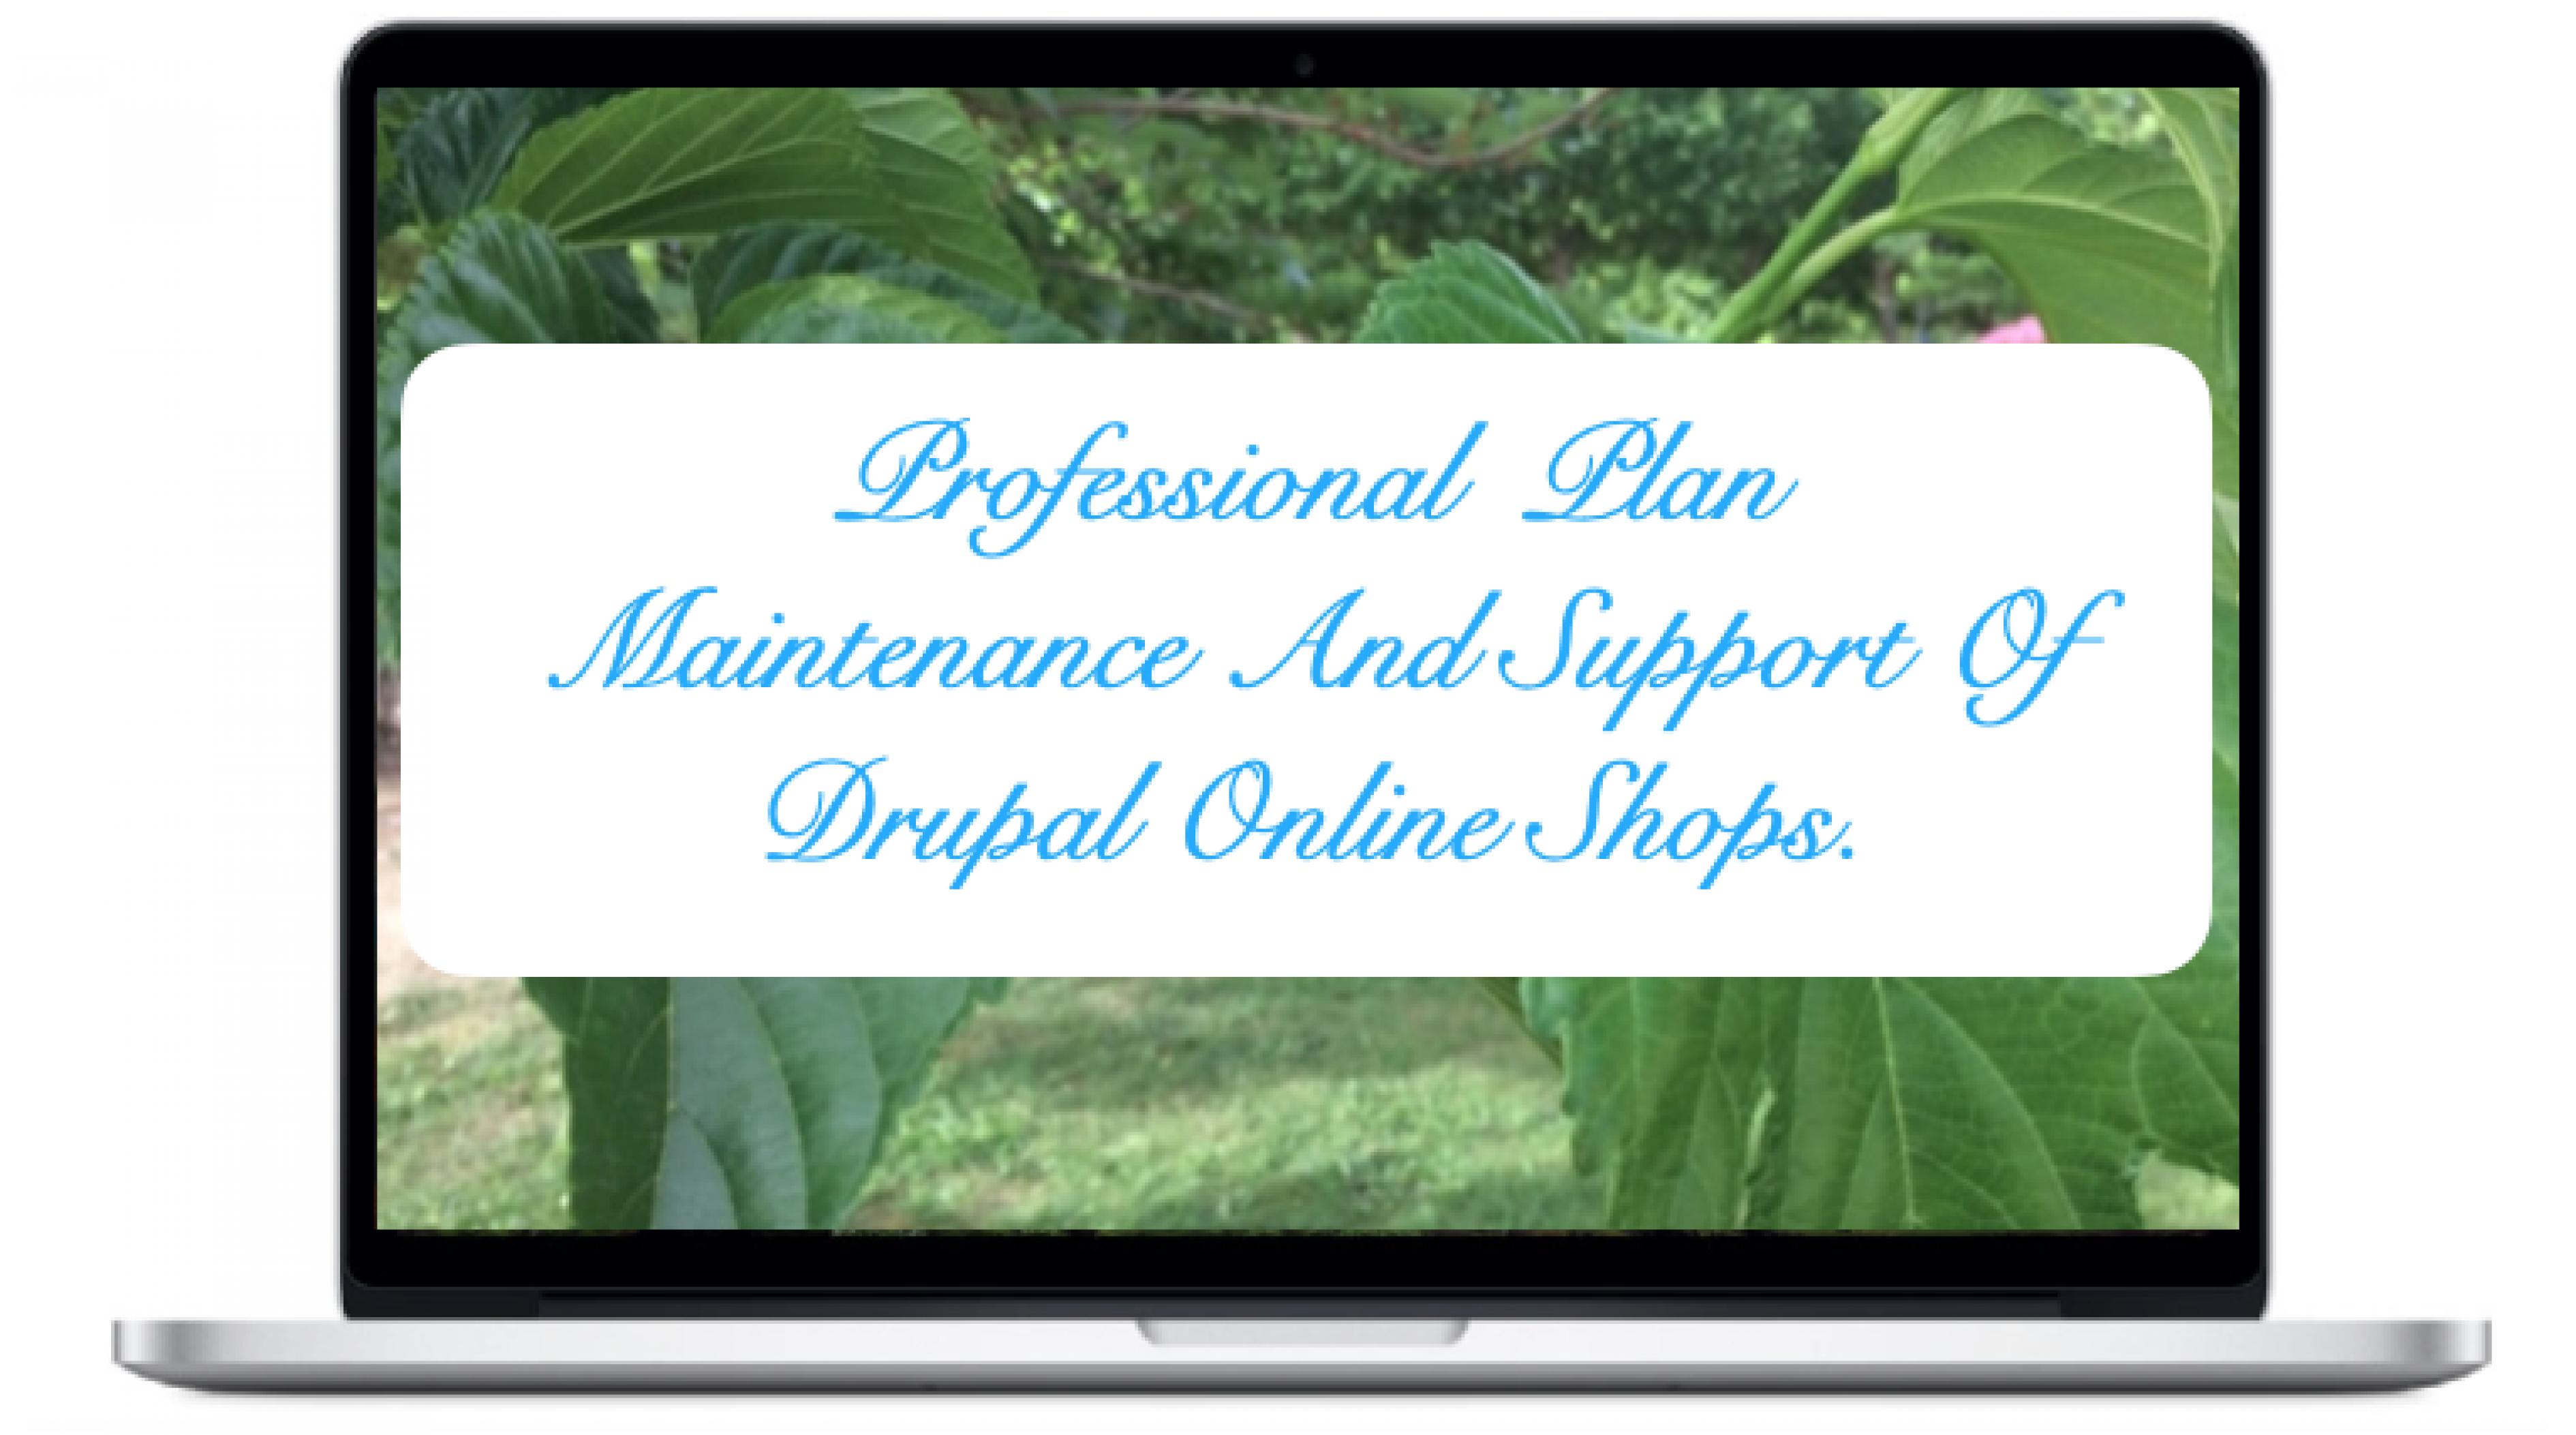 professional-maintenance-and-support-drupal-online-shops